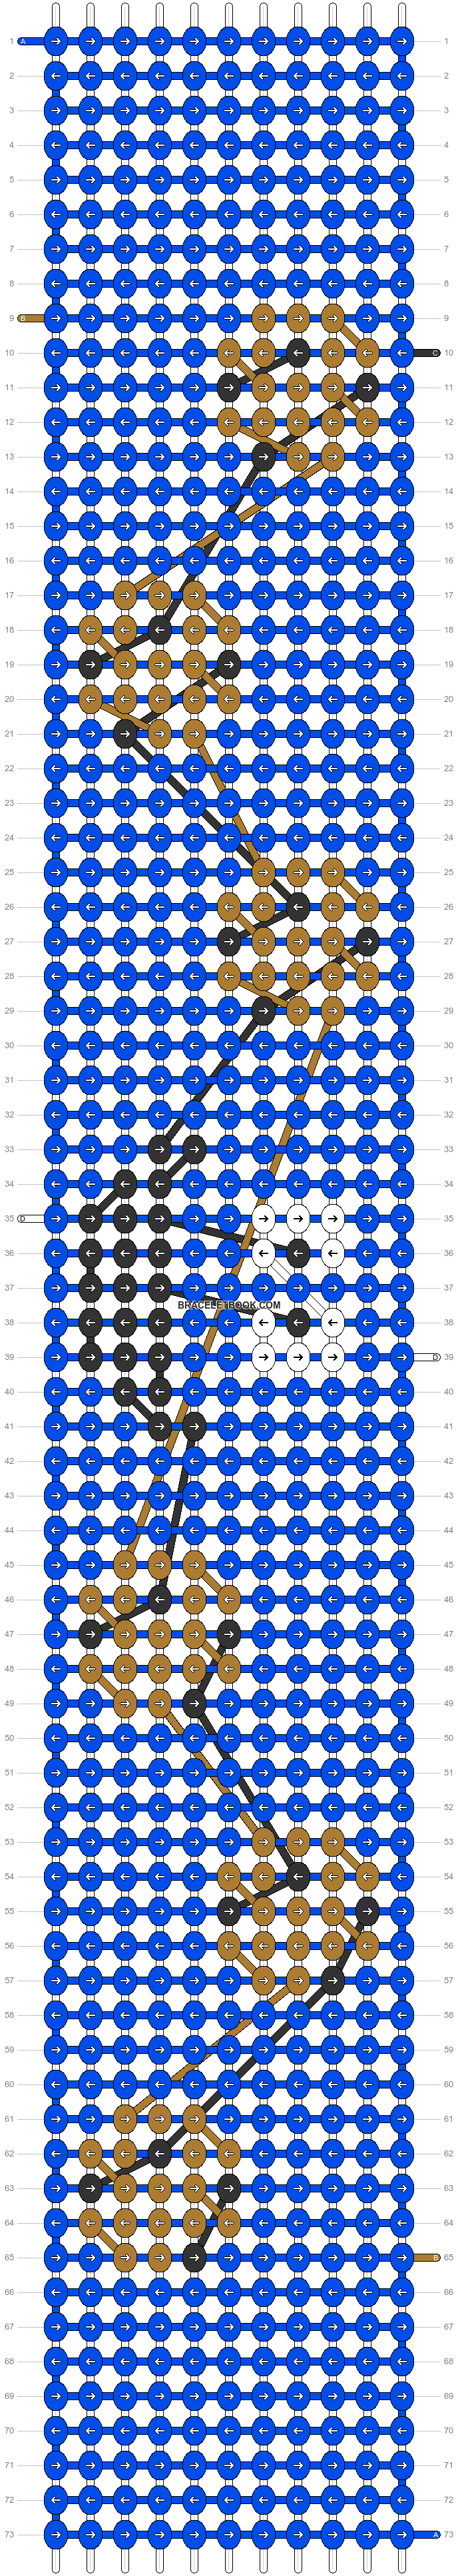 Alpha pattern #19722 pattern